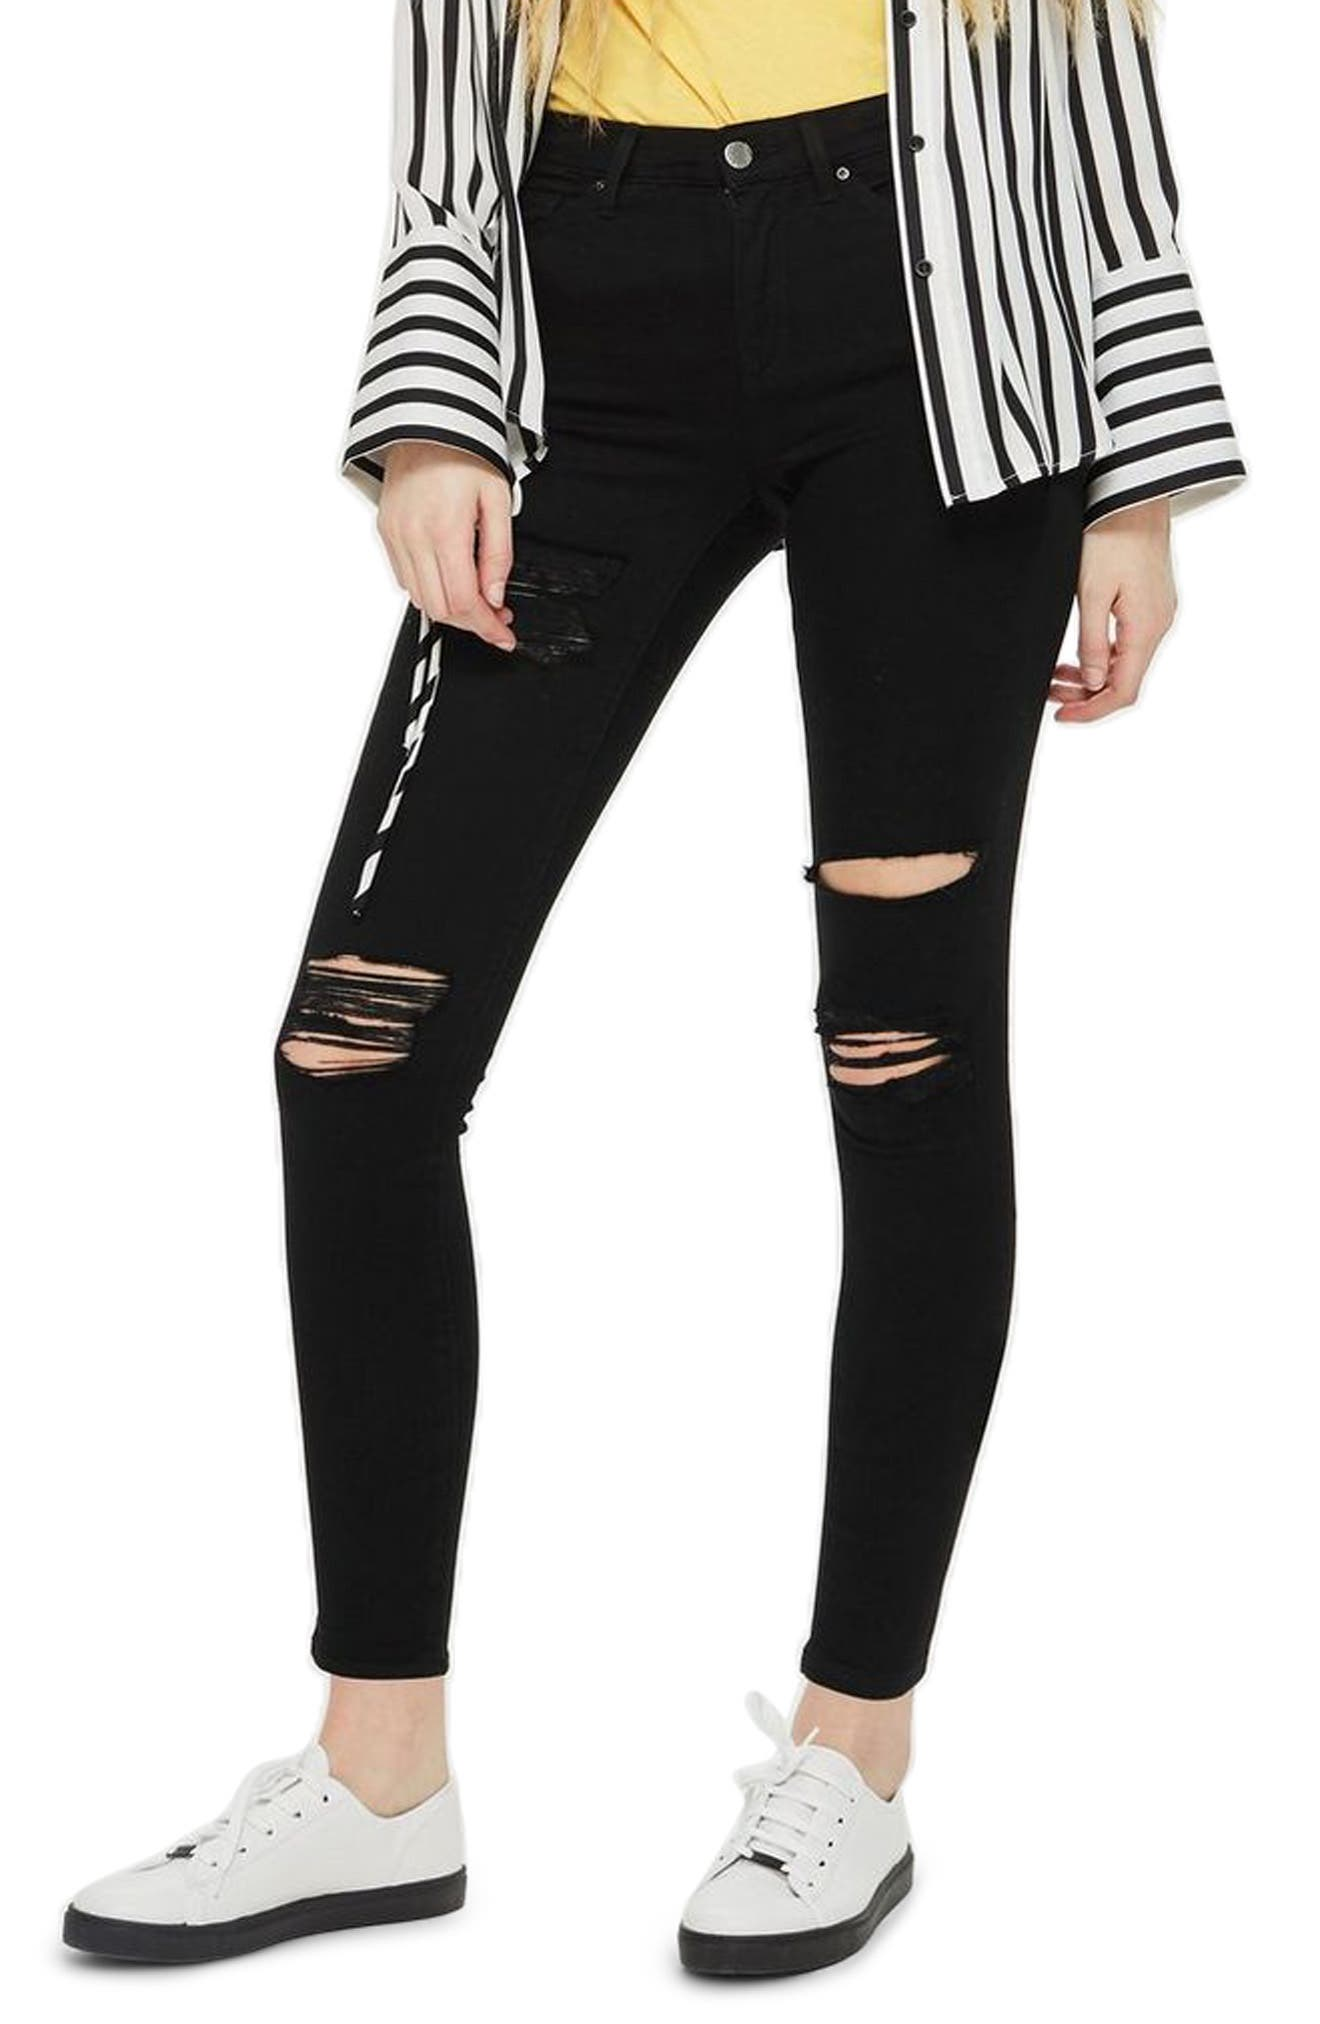 MOTO Leigh Super Rip Jeans,                             Main thumbnail 1, color,                             BLACK